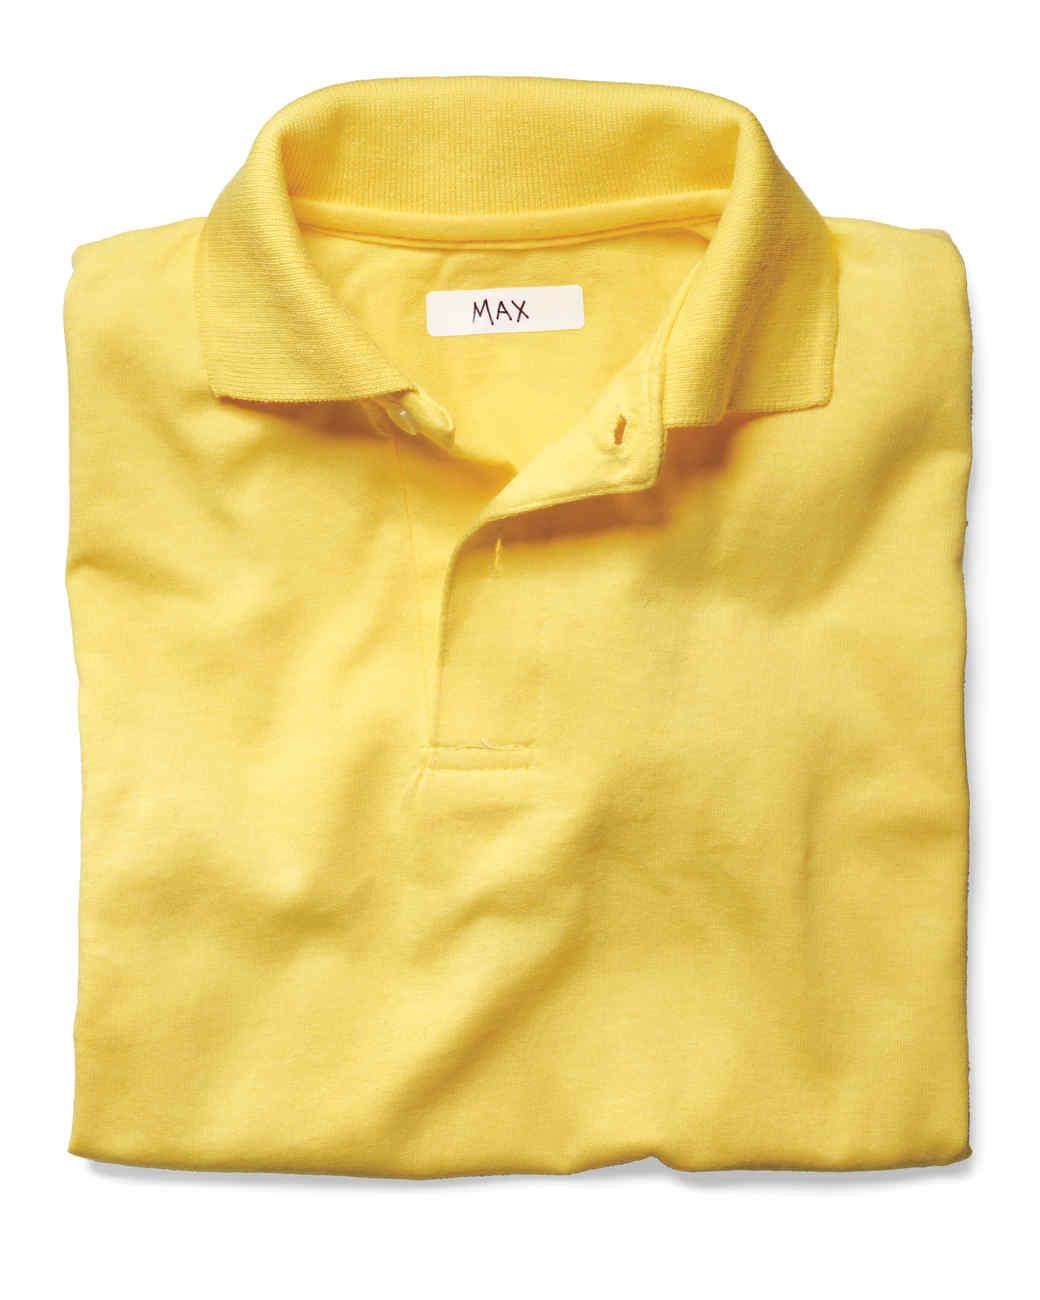 shirt-md108265.jpg